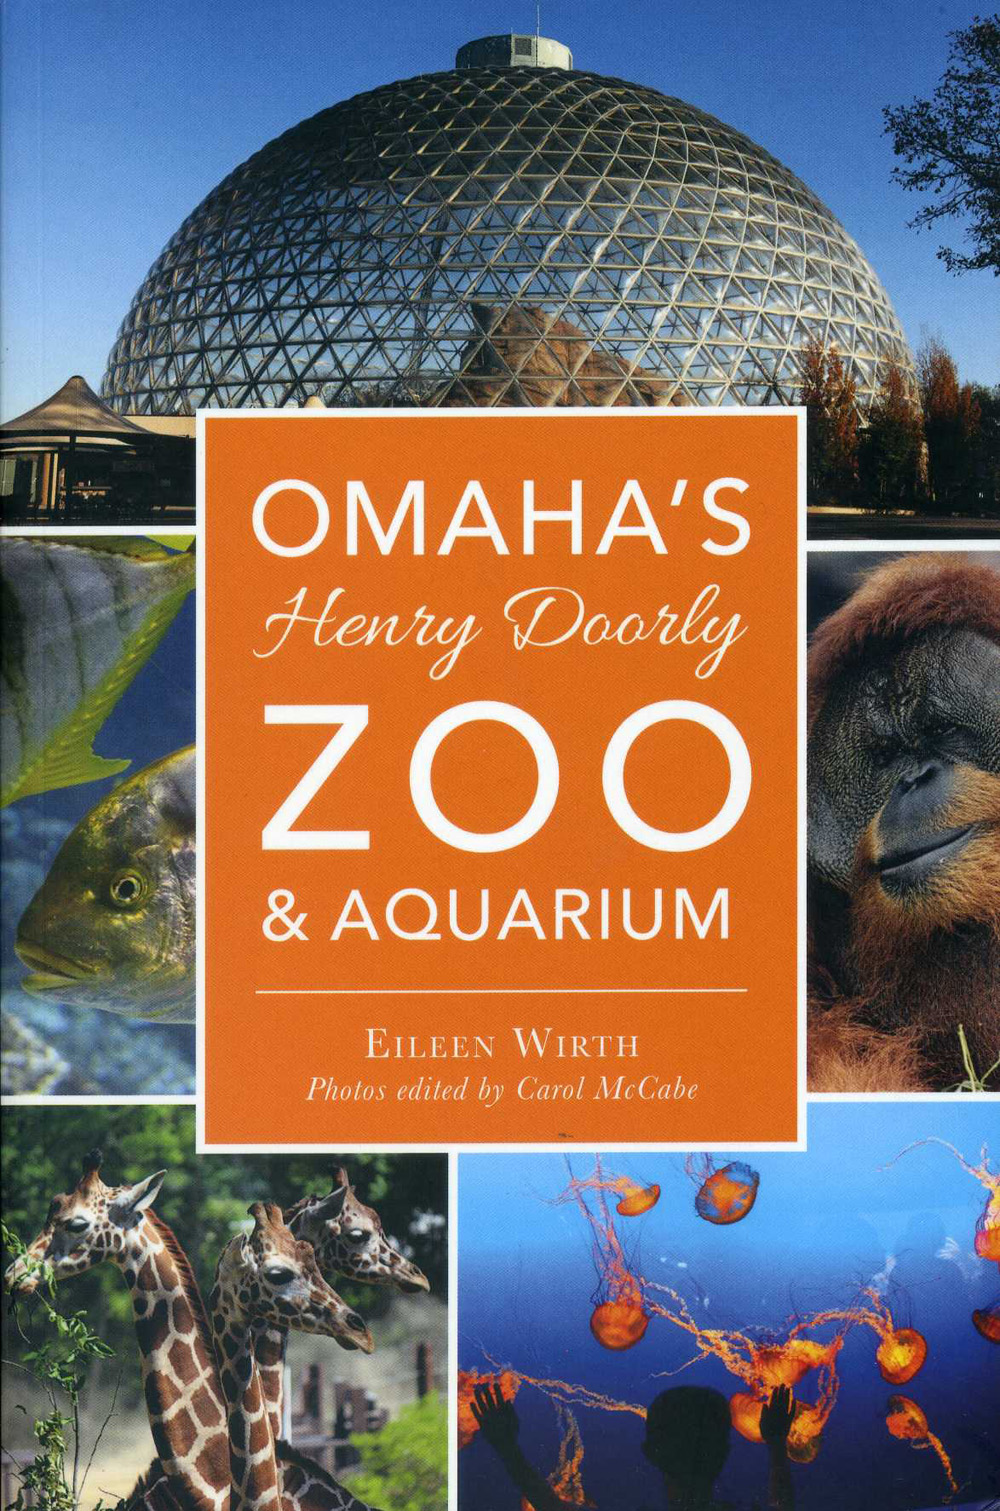 Les zoos dans le monde omaha 39 s henry doorly zoo aquarium for Charlestons omaha